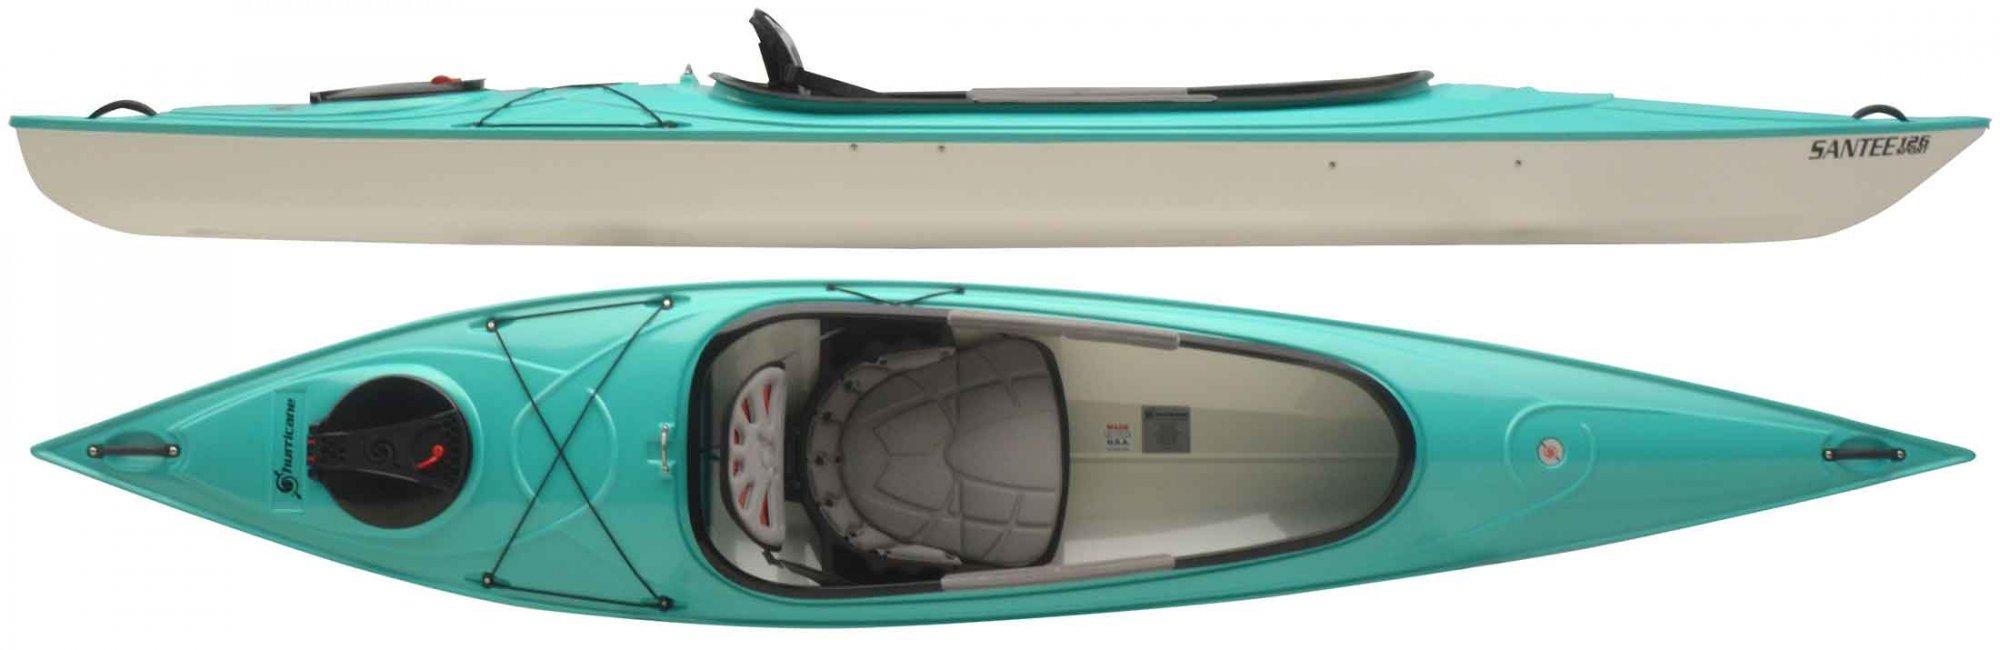 Hurricane Santee 126 Sport Kayak